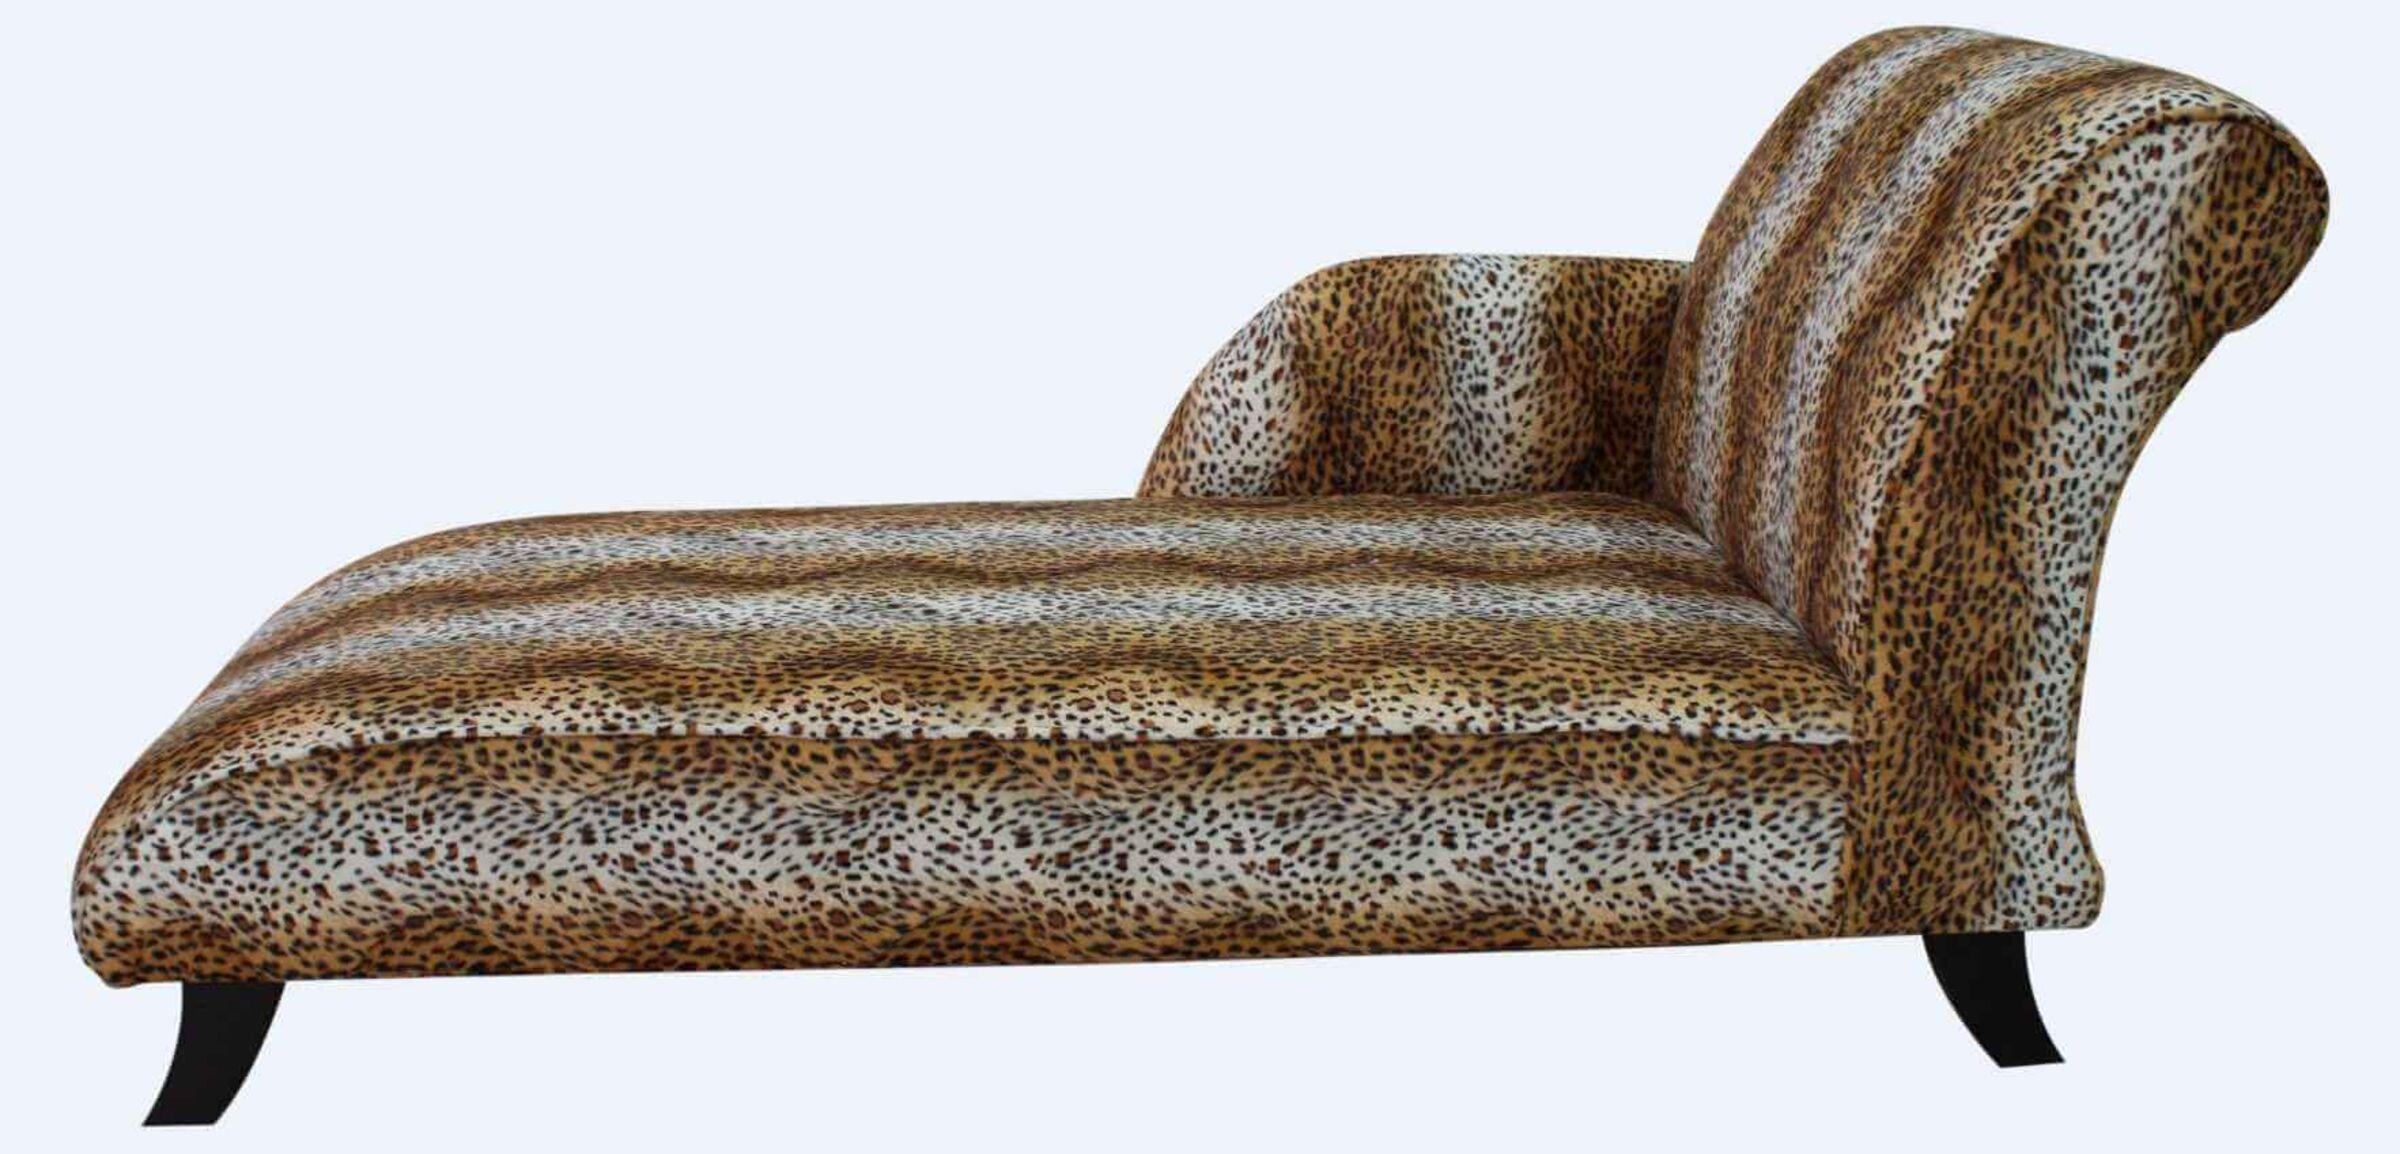 Cheetah Chaise Lounge Sofa Seat Free Warranty Designersofas4u